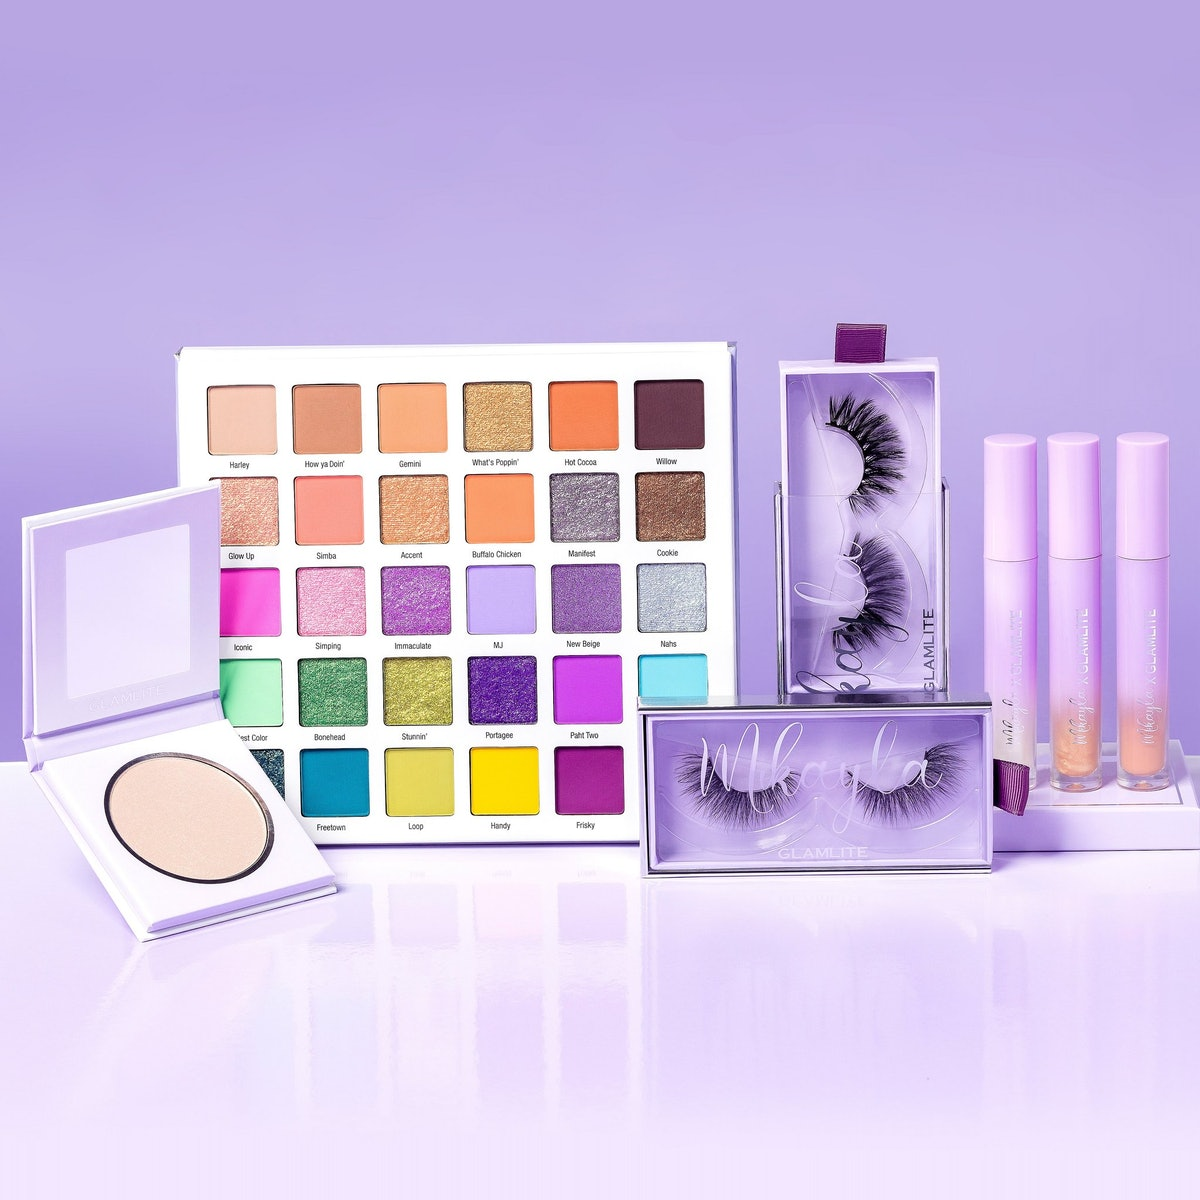 Mikayla x Glamlite Full Collection